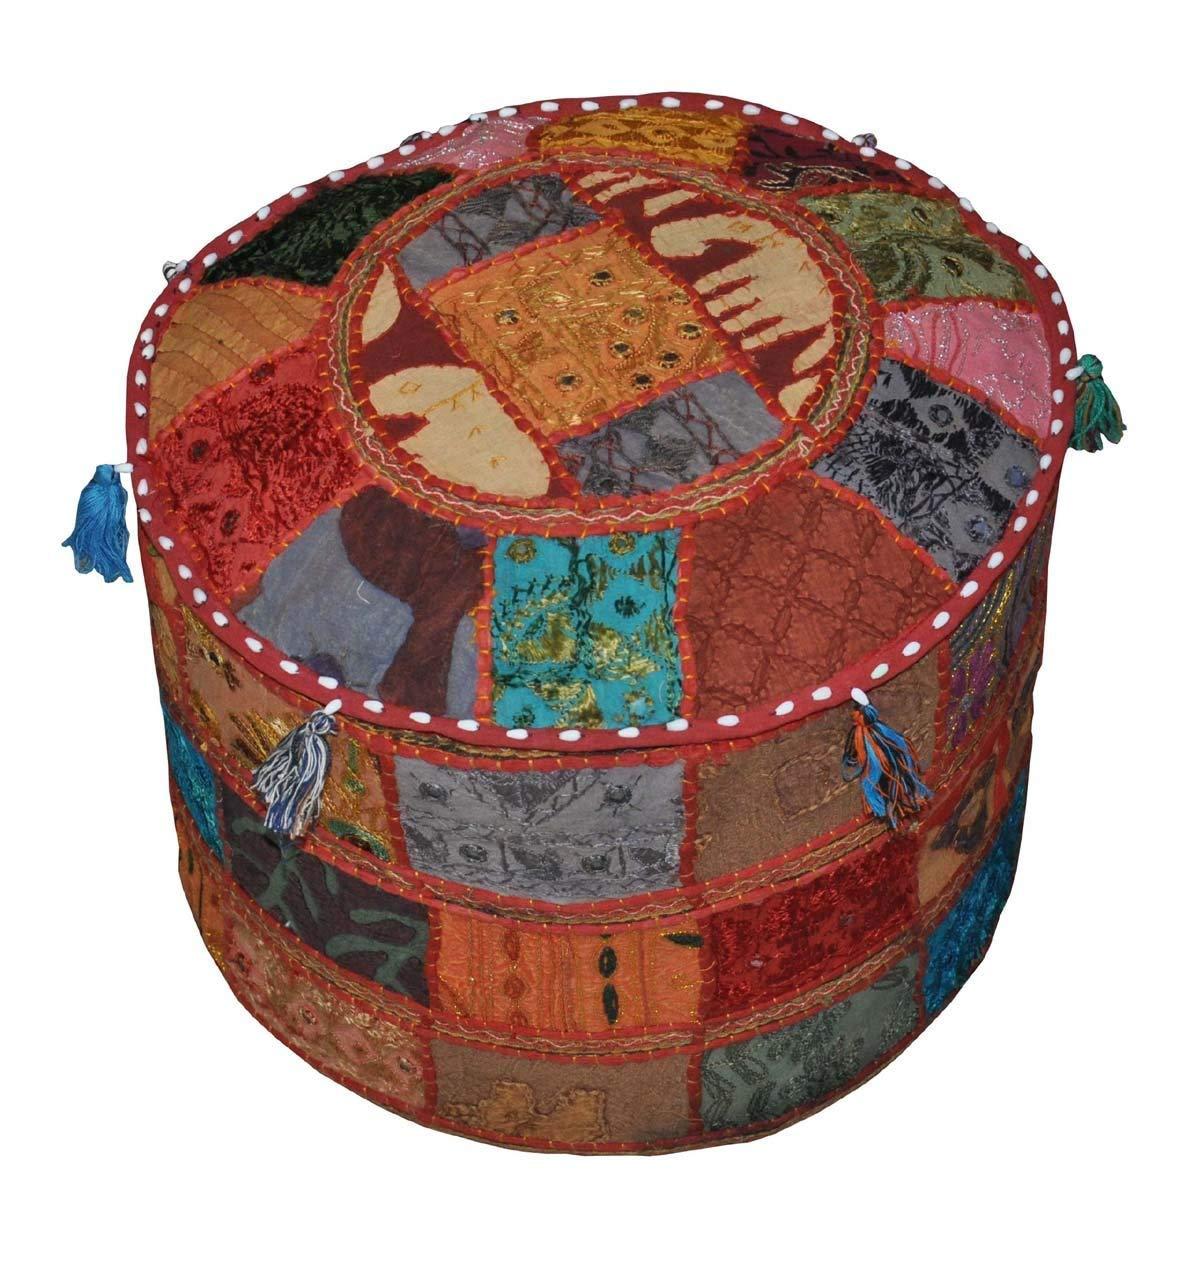 GANESHAM Footstool Pouf Ottoman Indian Living Room Decor Hippie Patchwork Bean Bag Boho Chic Bohemian Hand Embroidered Ethnic Handmade Vintage Cotton Floor Pillows & Cushion 13'' H x 18'' Diam.